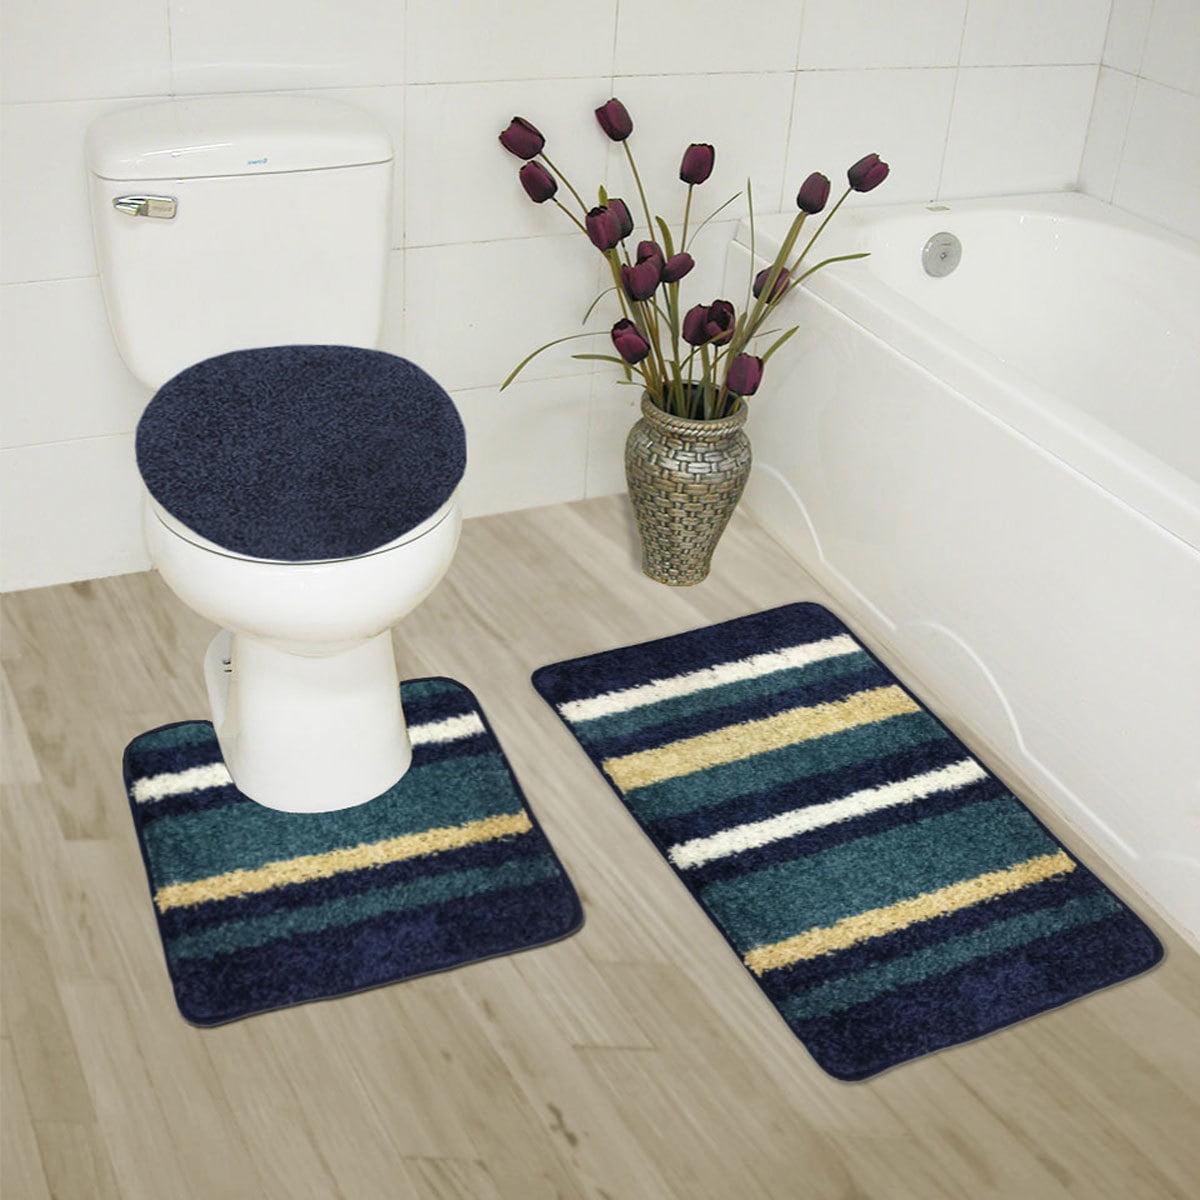 abby 3 piece bathroom rug set, bath rug, contour rug, lid cover